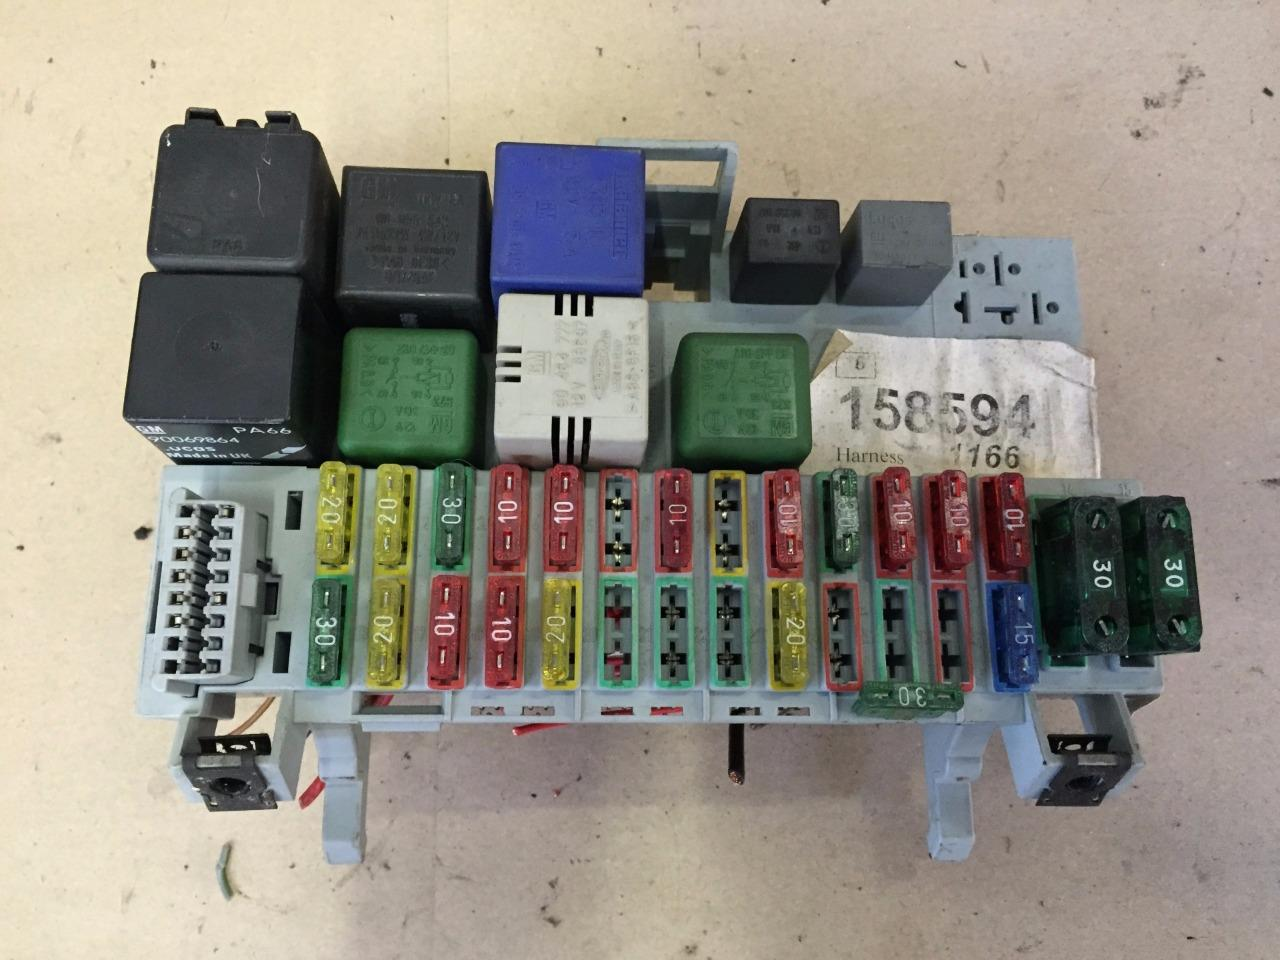 vauxhall astra fuse box mk4 wz 0696  astra sri fuse box  wz 0696  astra sri fuse box